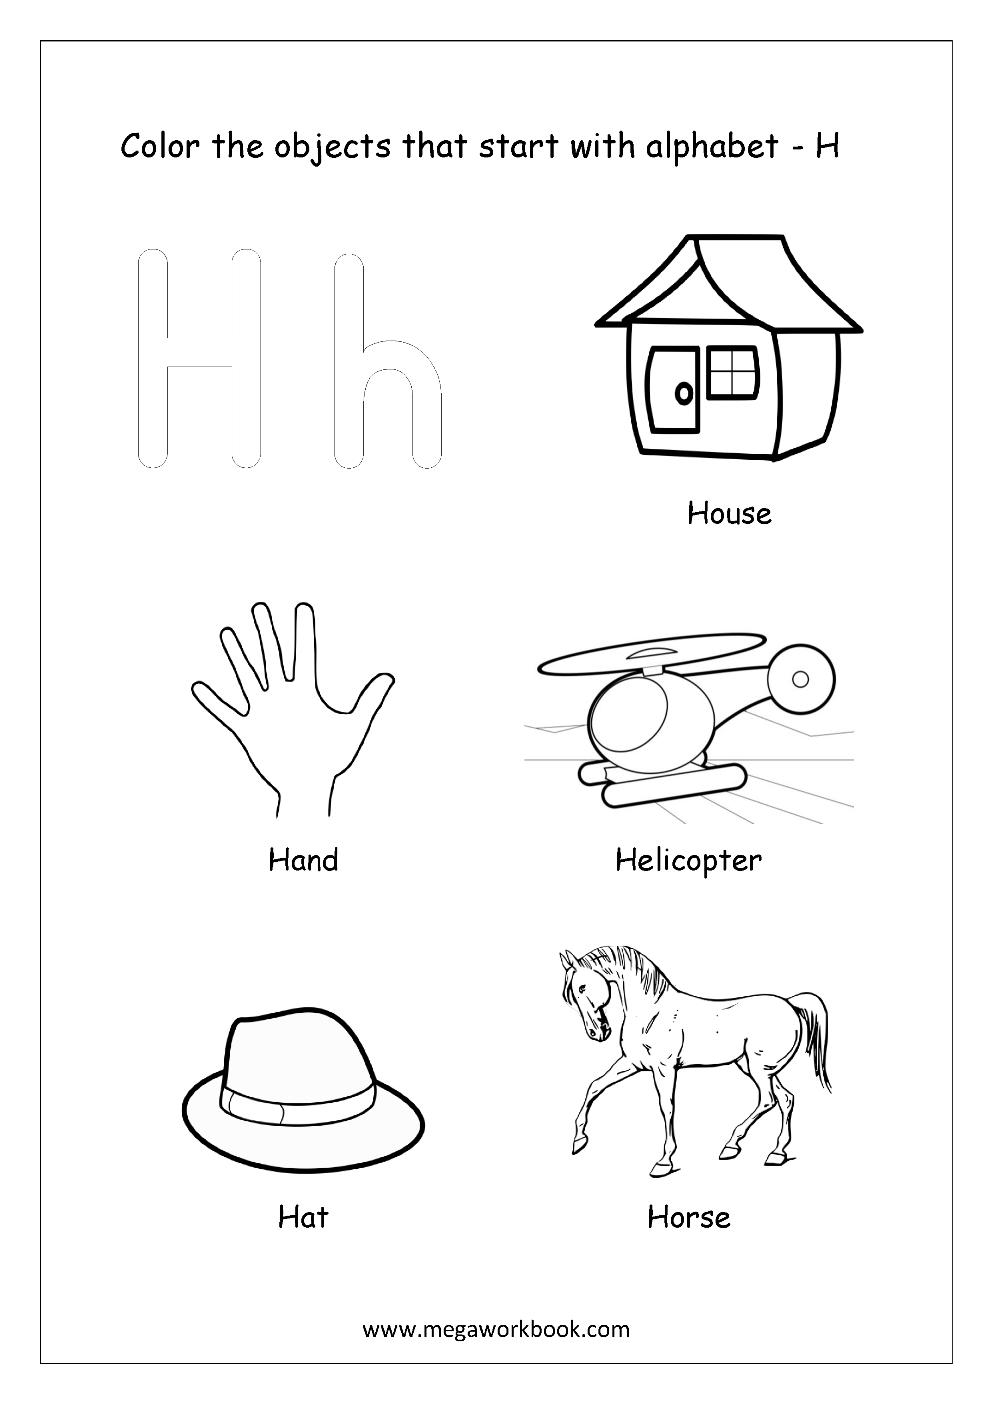 Free english worksheets alphabet picture coloring megaworkbook english worksheet color the objects starting with alphabet h altavistaventures Images